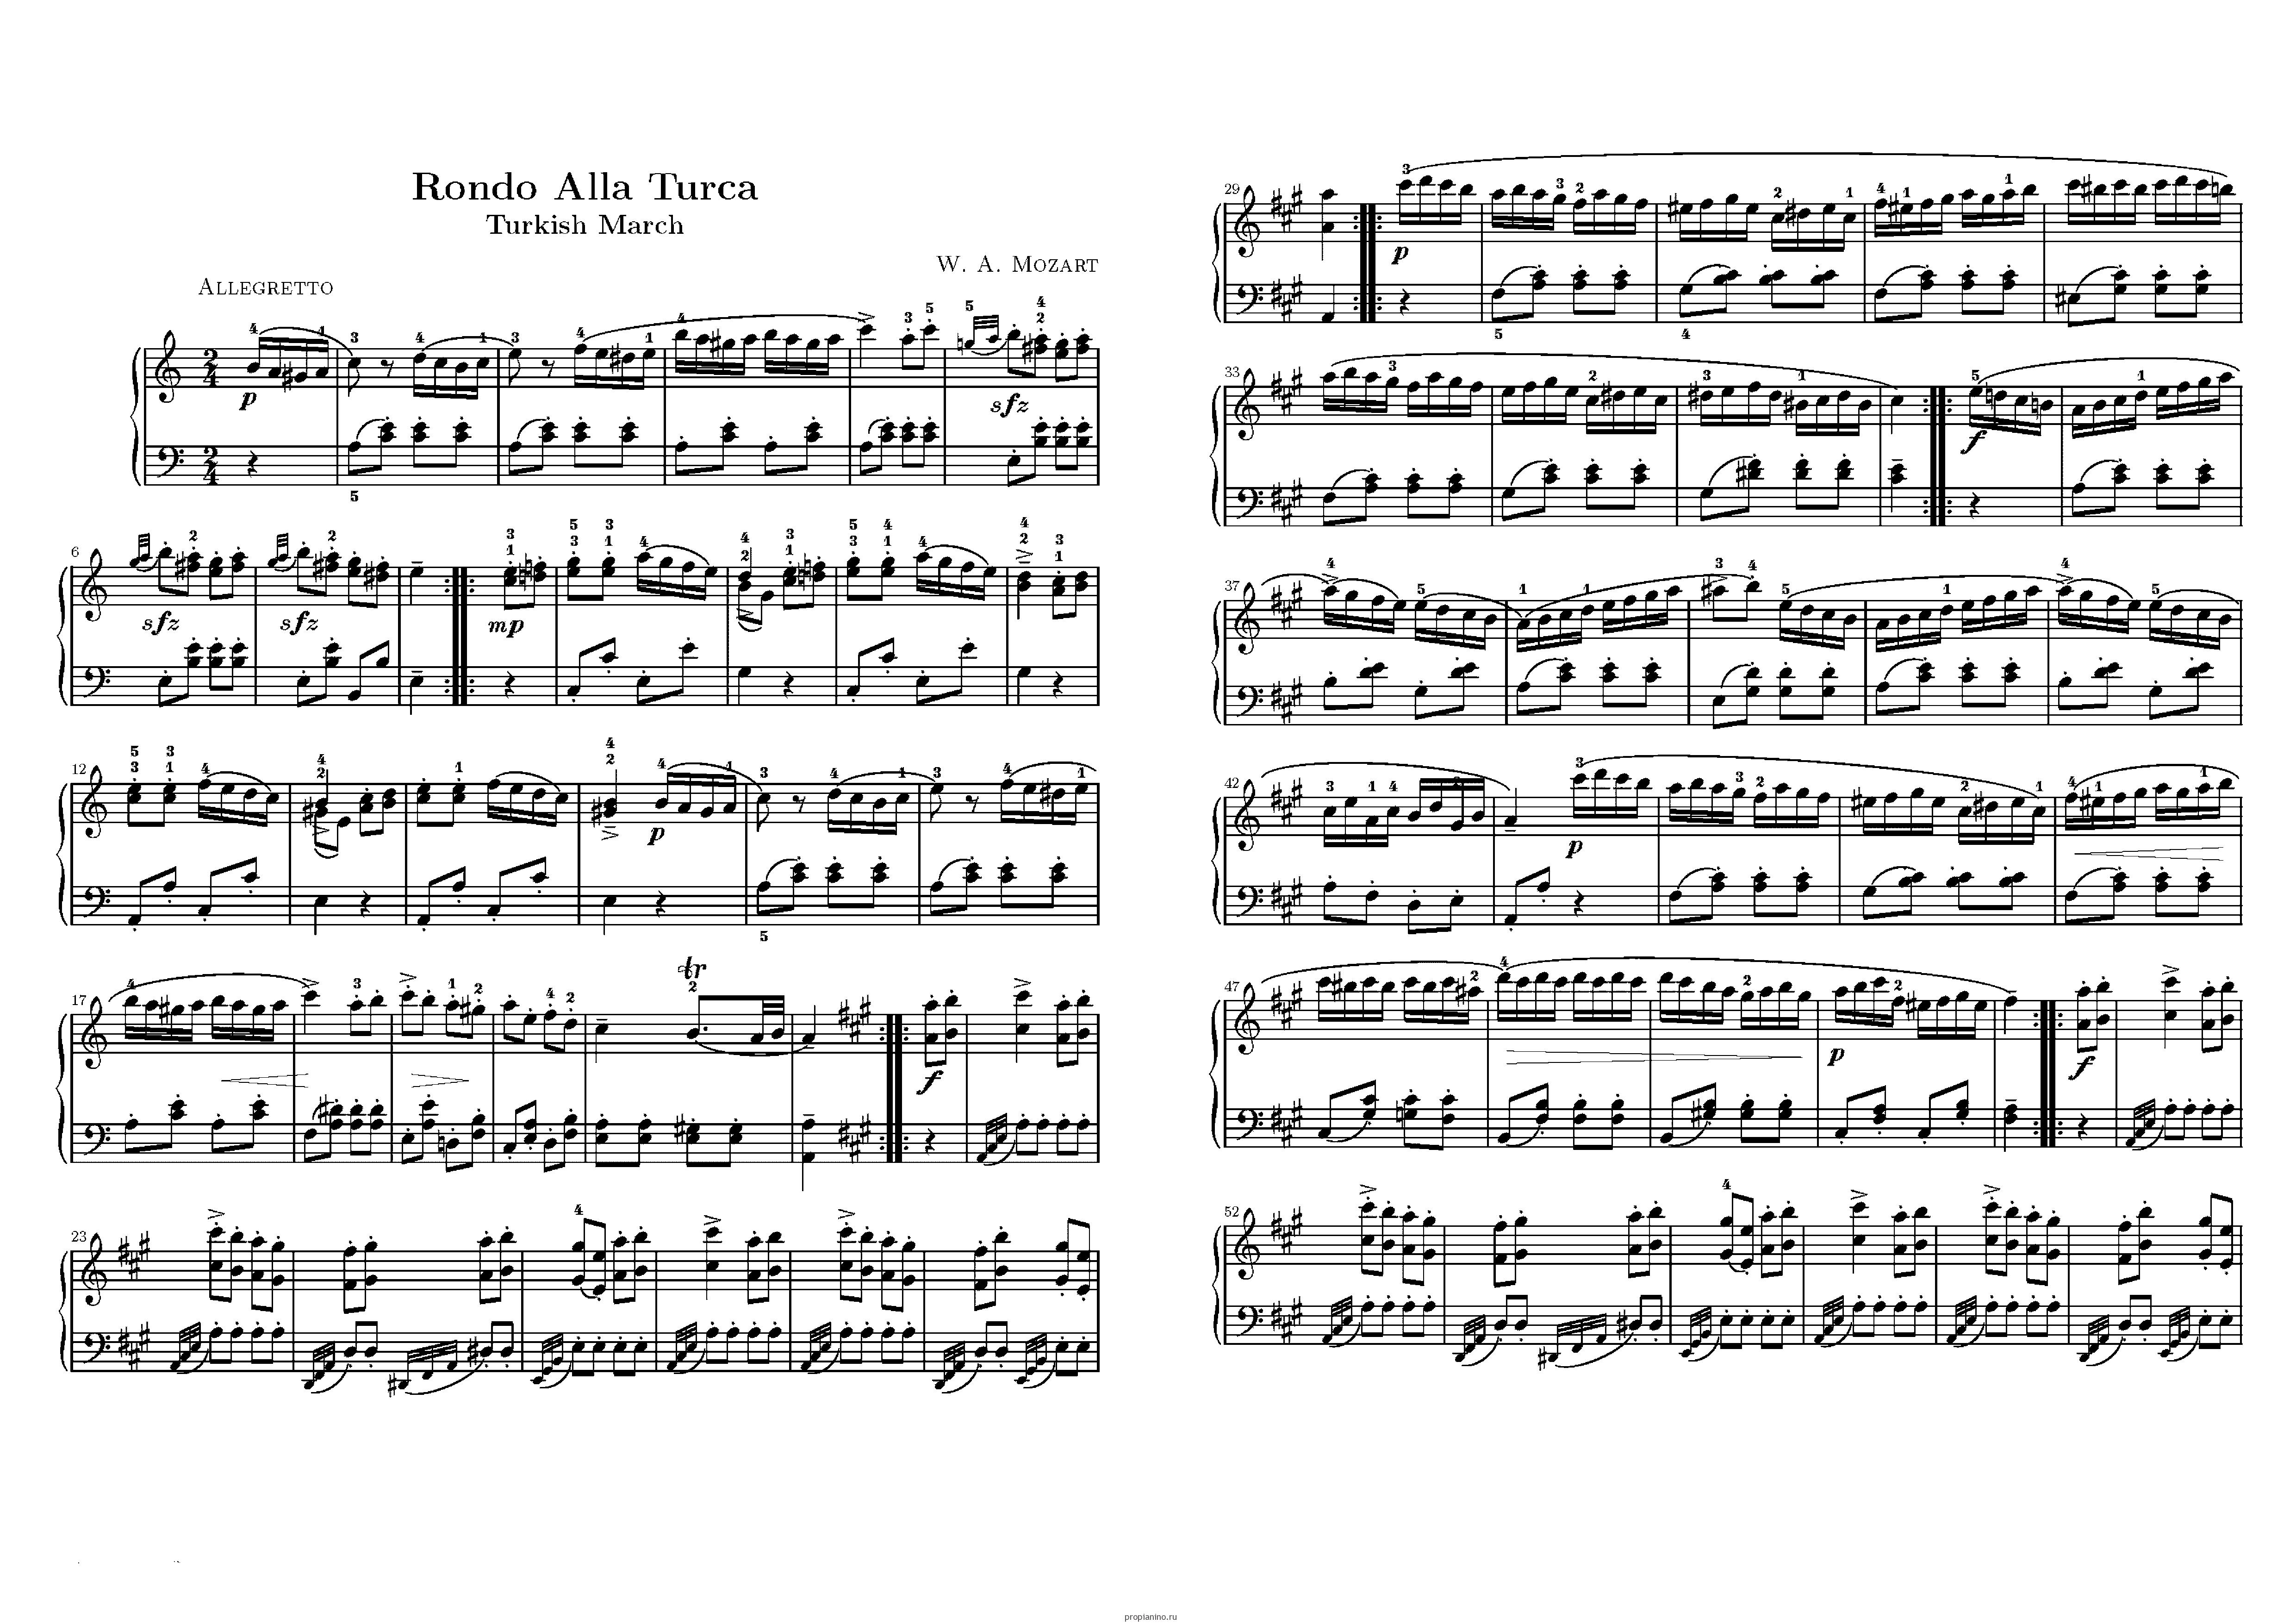 Турецкий марш (Rondo alla turca) В.А. Моцарт: ноты